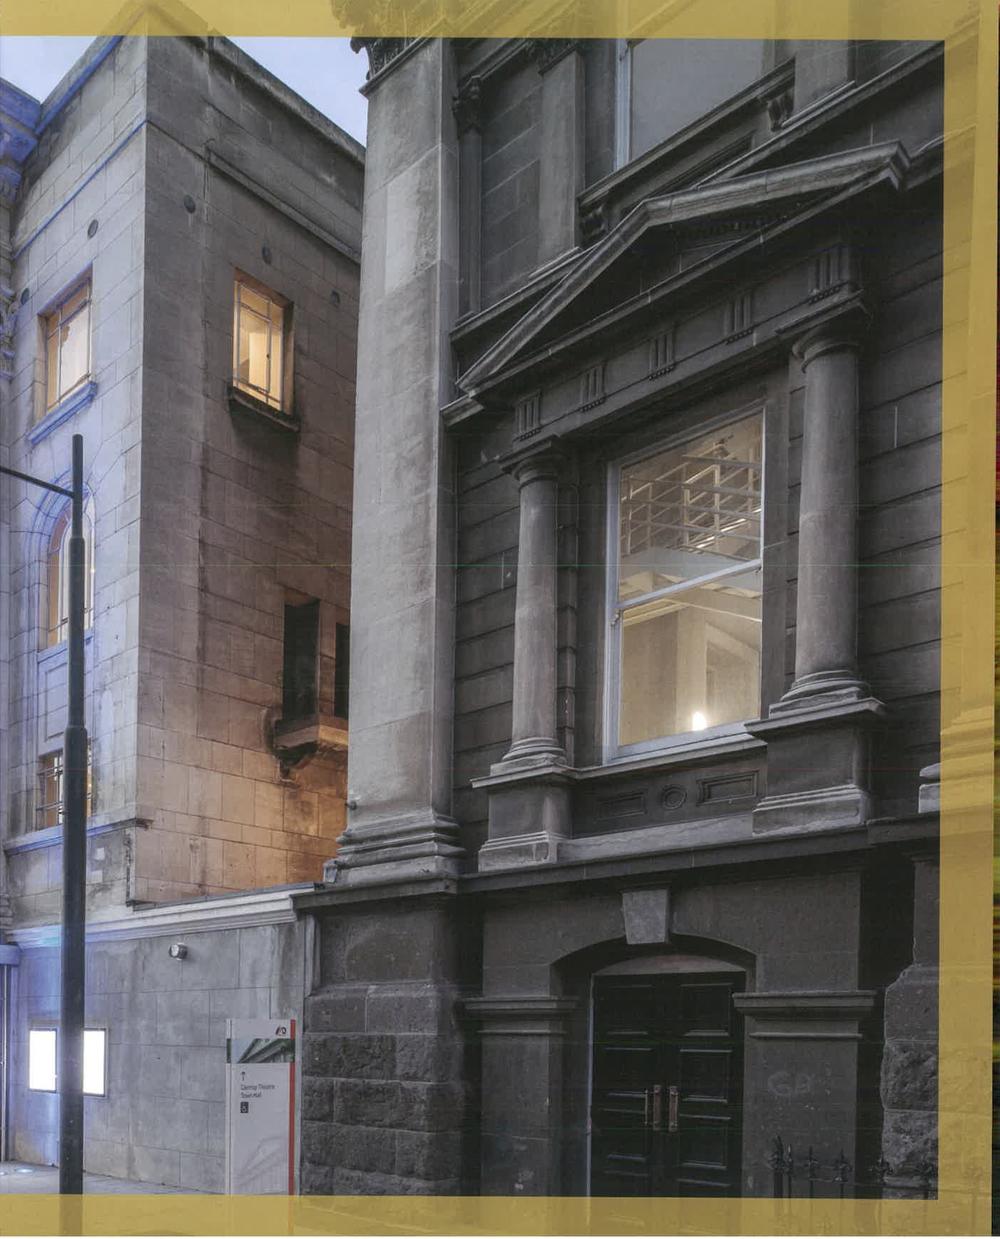 Dunedin Town Hall - Interiors Article Dec - Feb 2014 - 2015_2.jpg